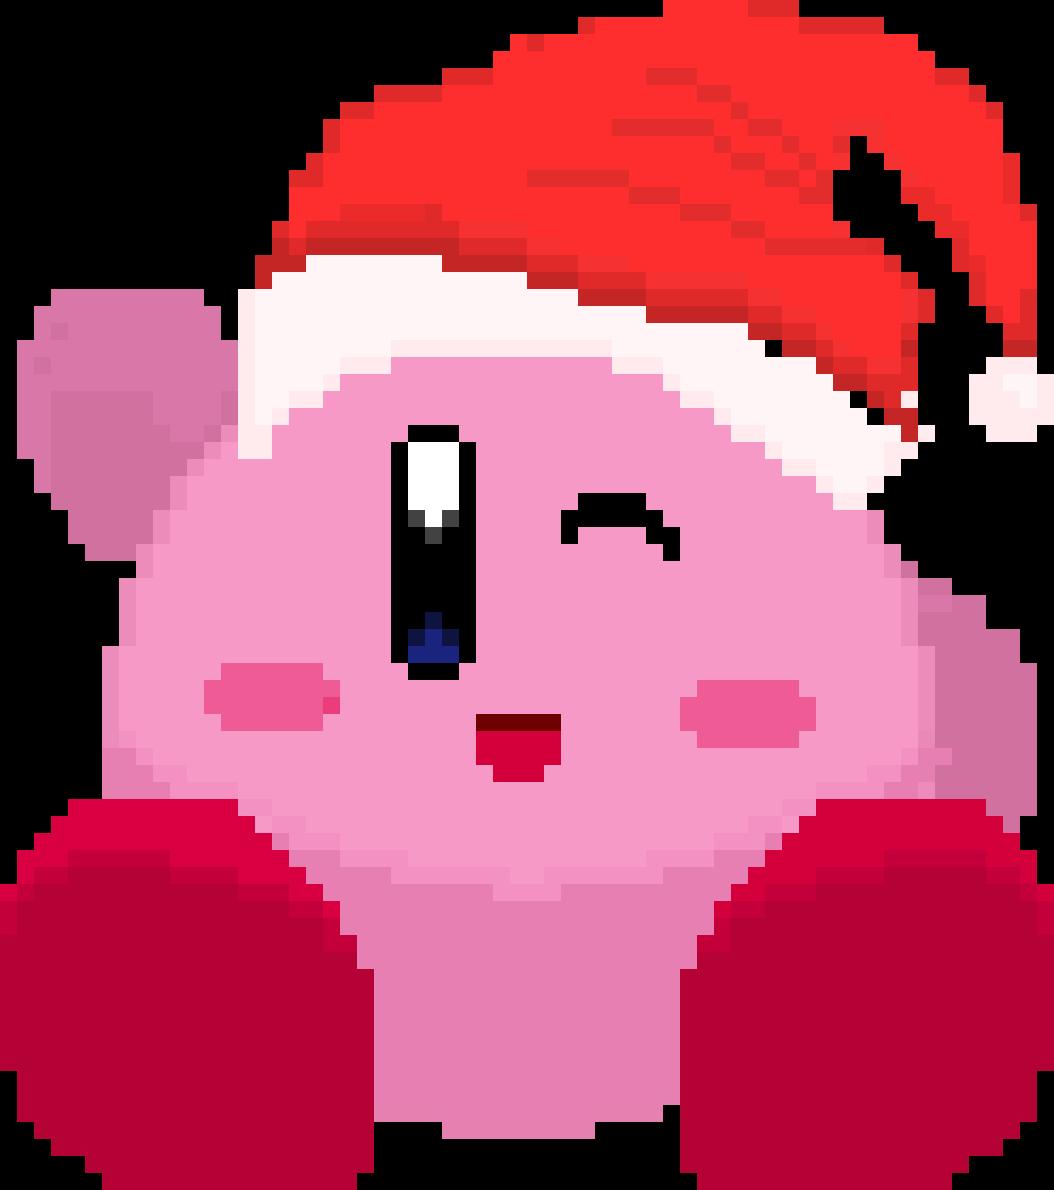 Pixilart - Merry Christmas Kirby by ThouArtArt